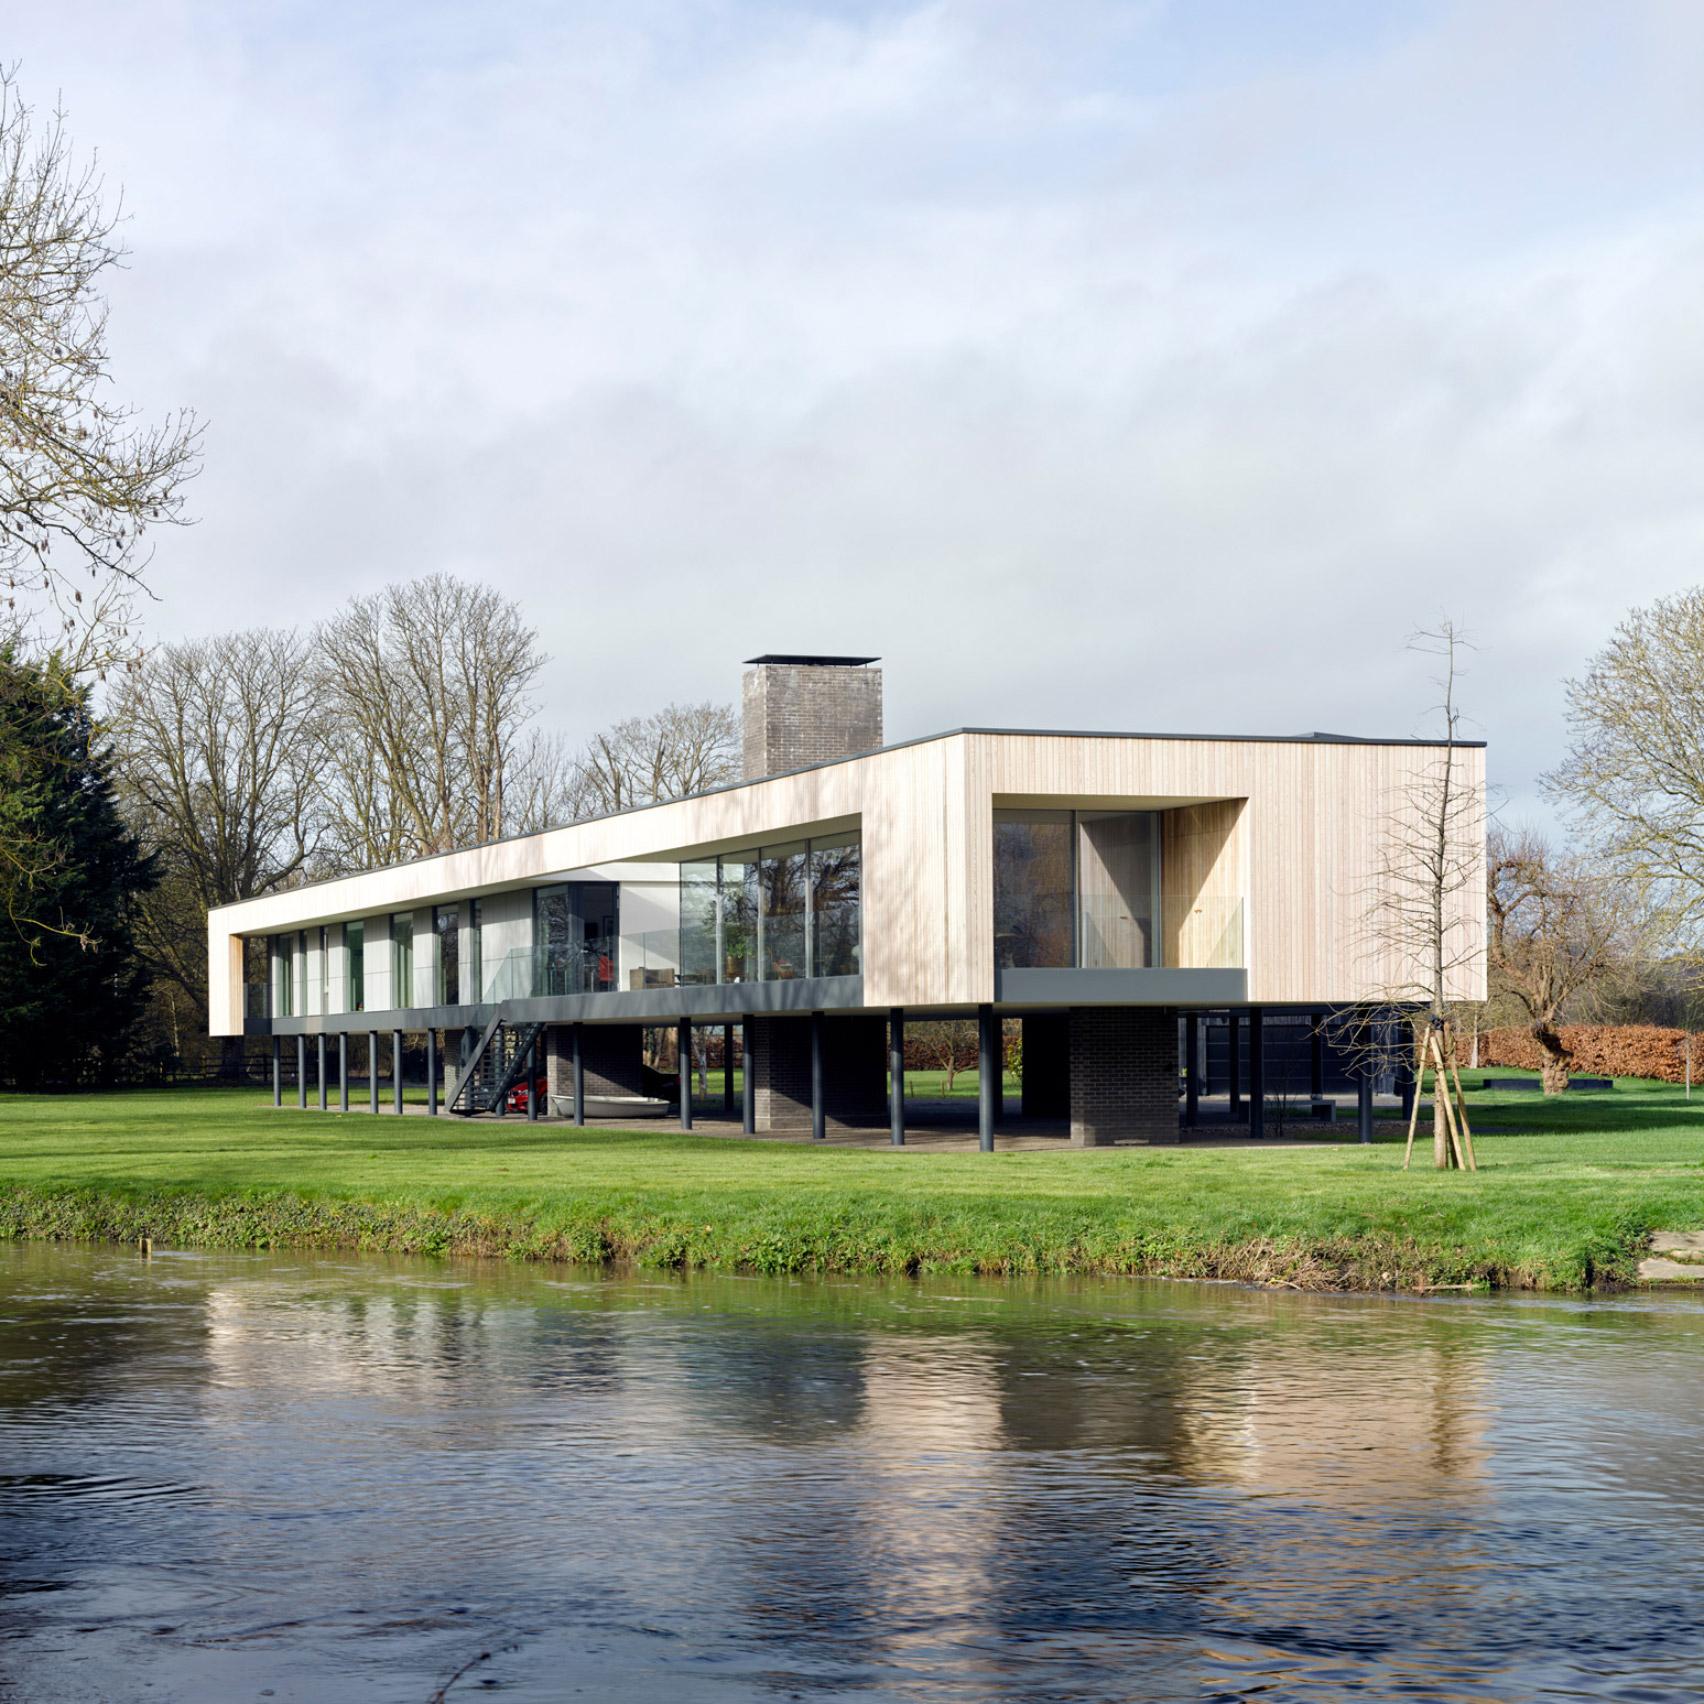 Narula House Raised On Stilts Over River Thames Flood Zone